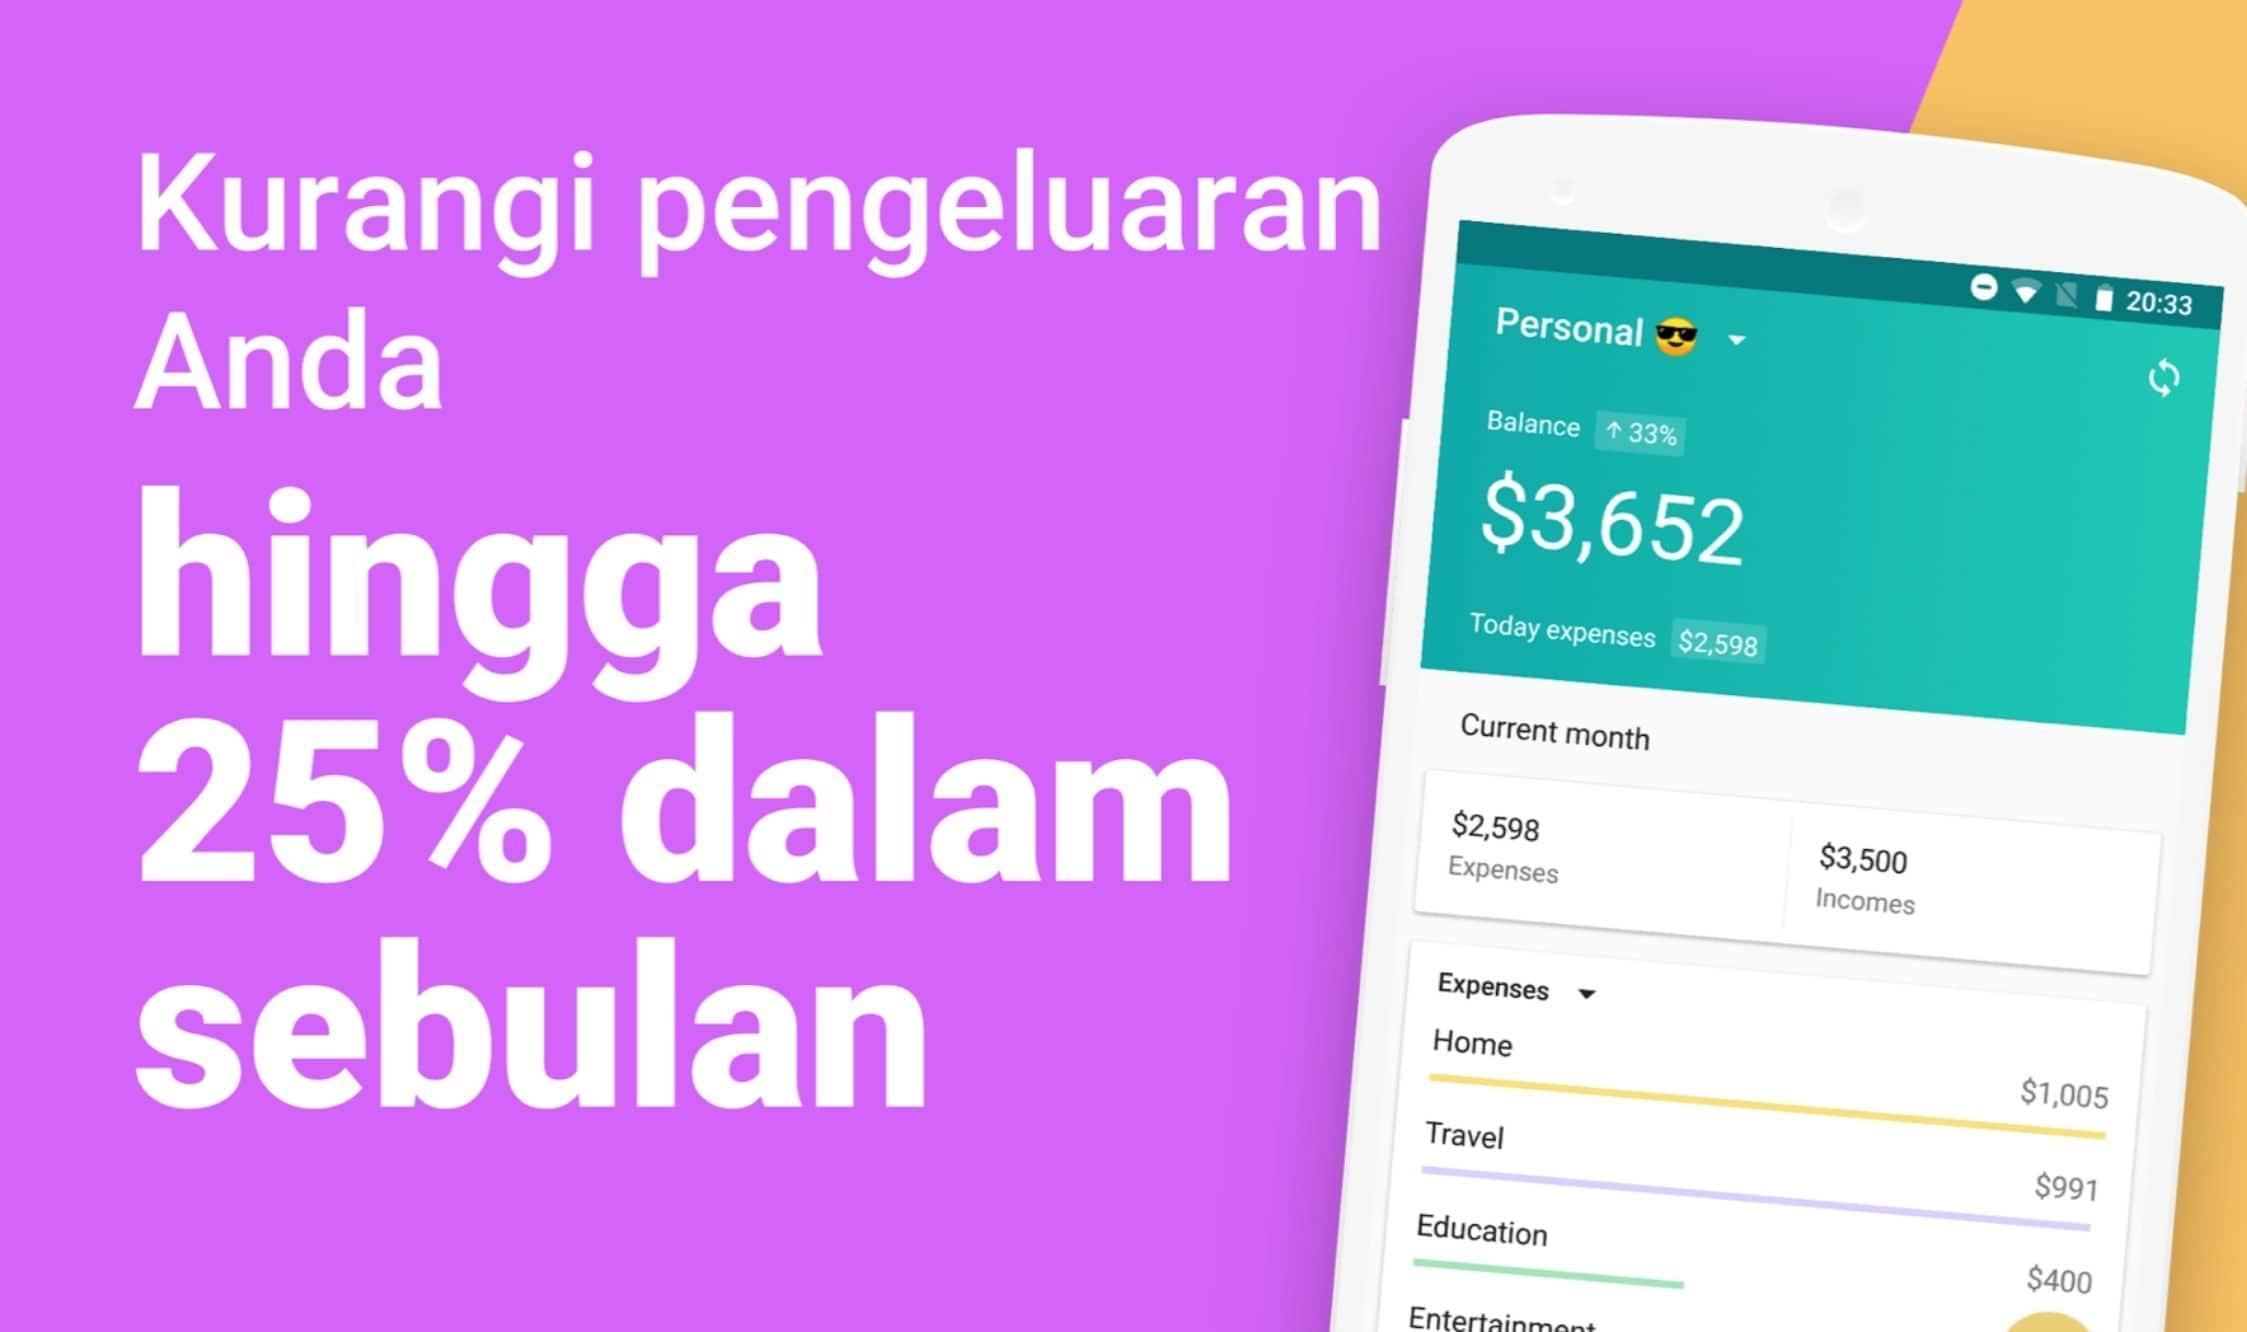 aplikasi pengatur keuangan moneon